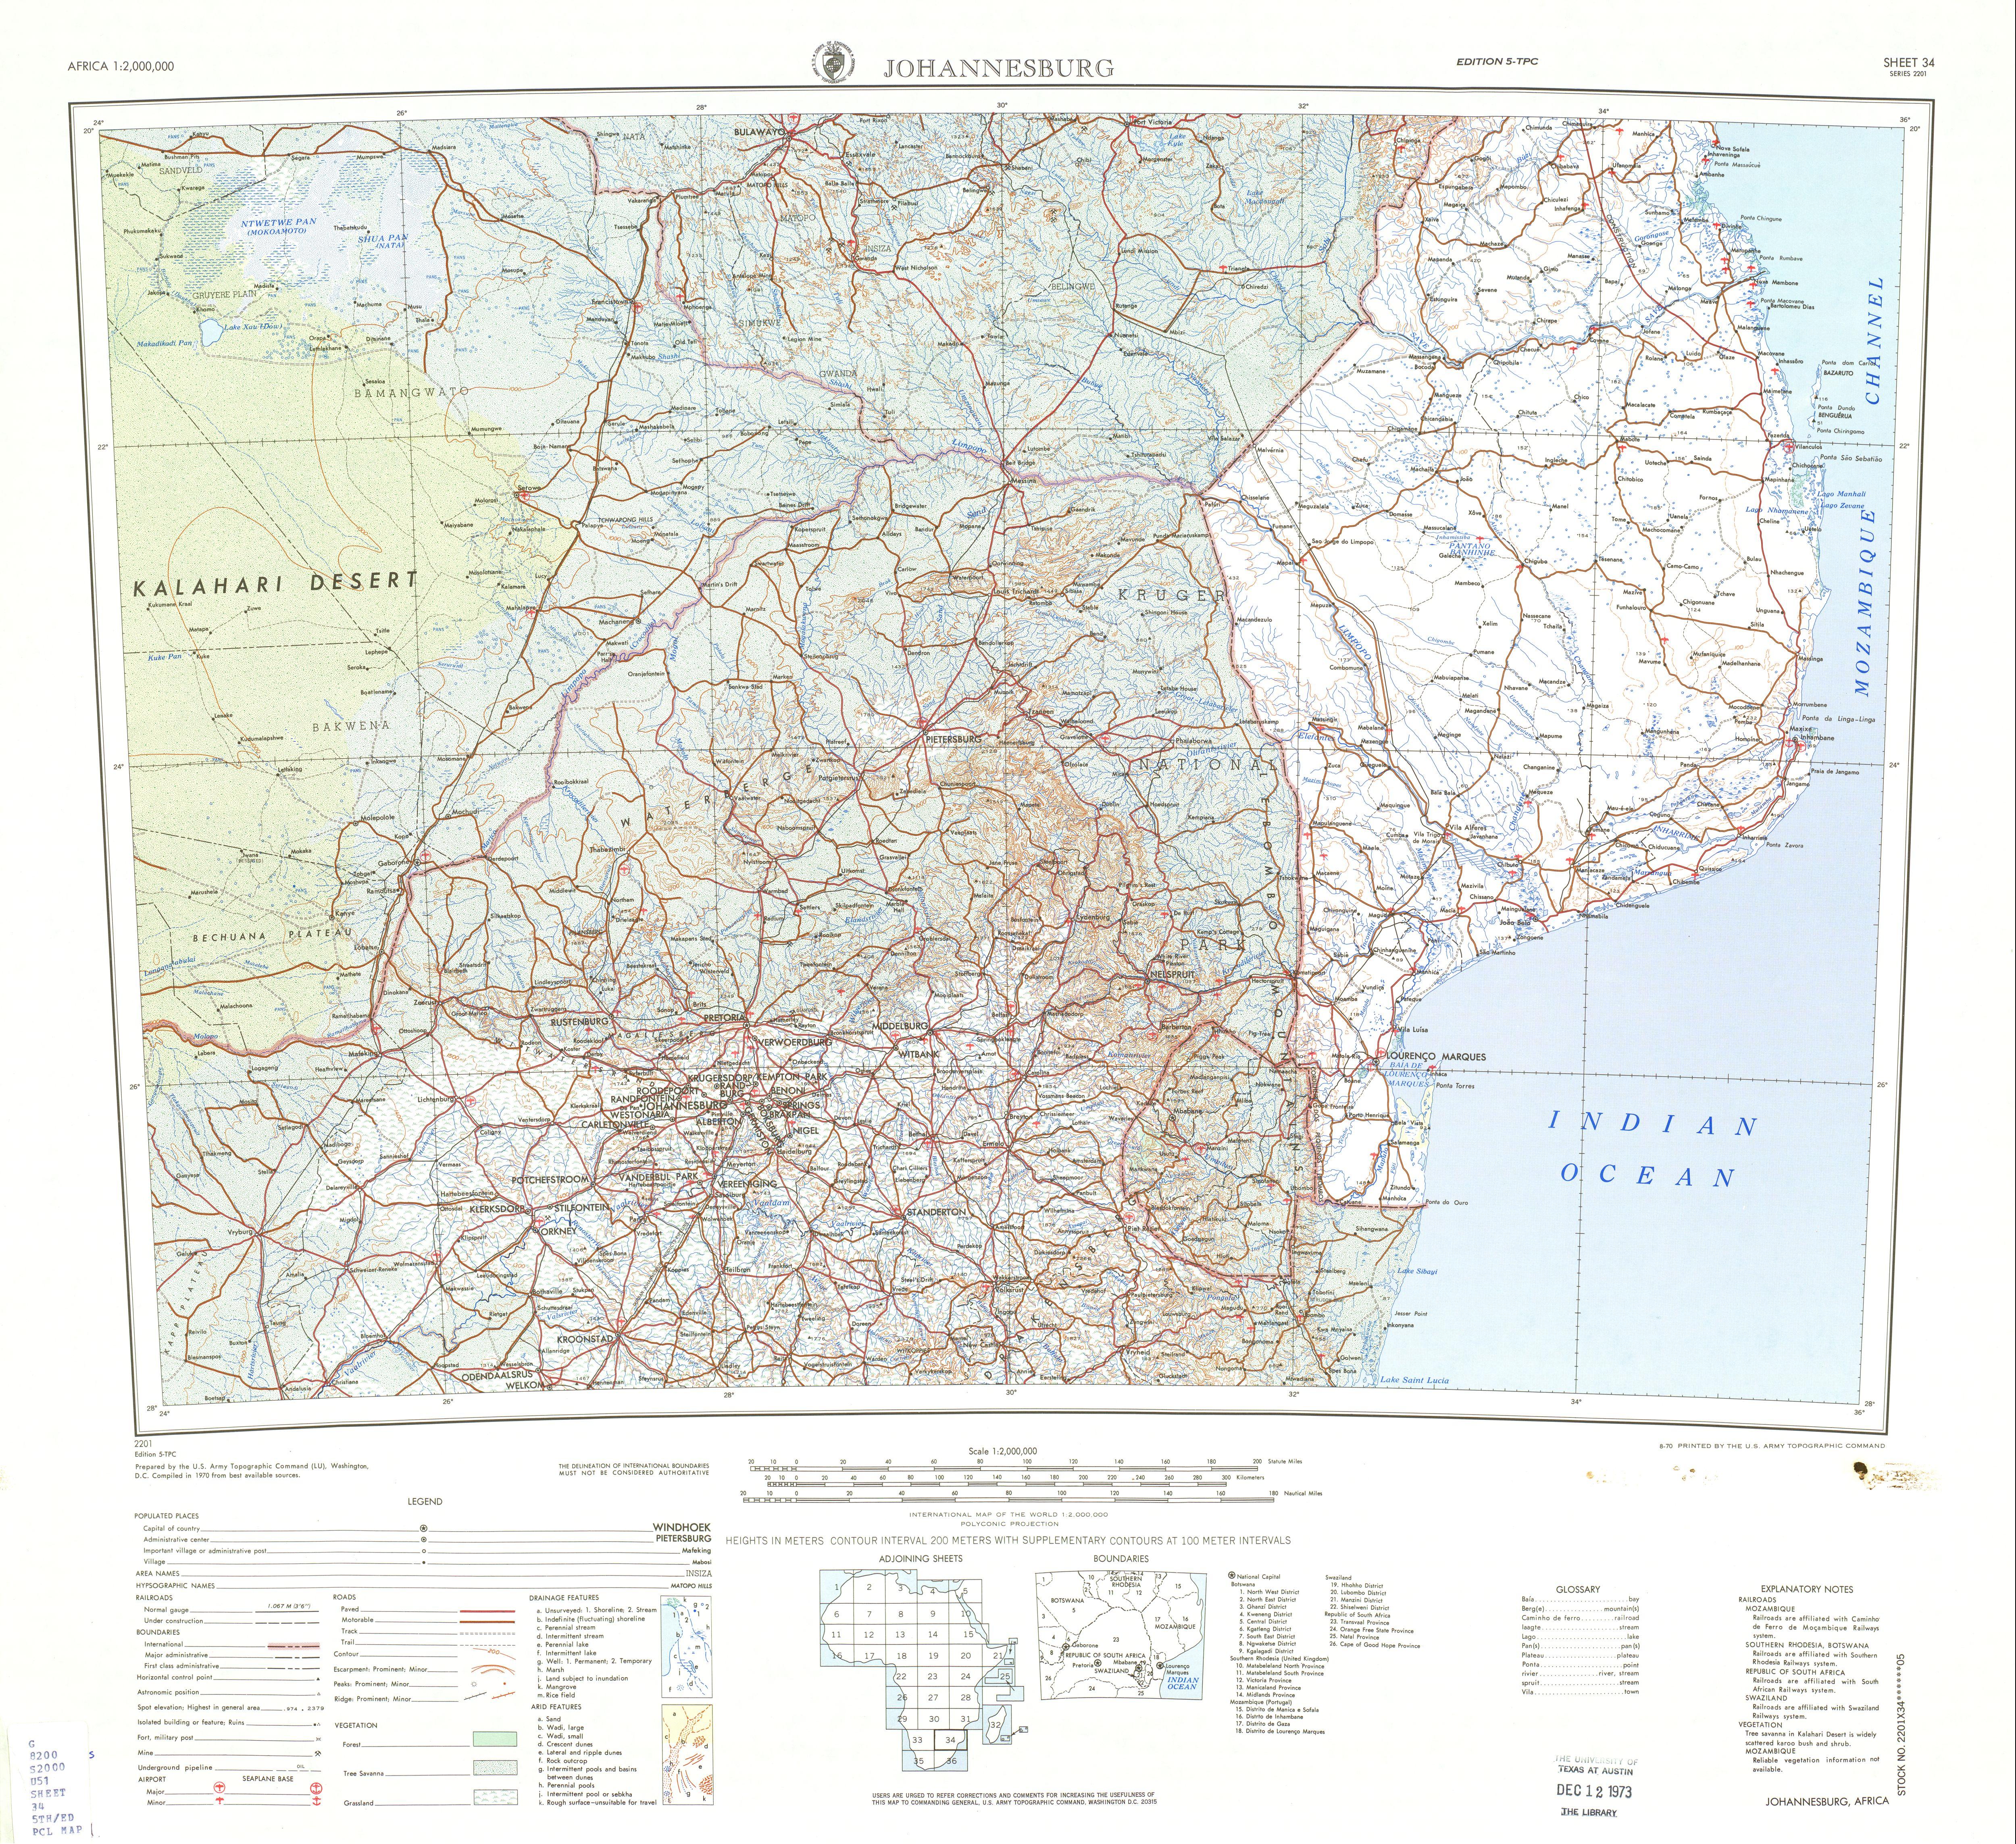 Hoja Johannesburgo del Mapa Topográfico de África 1970